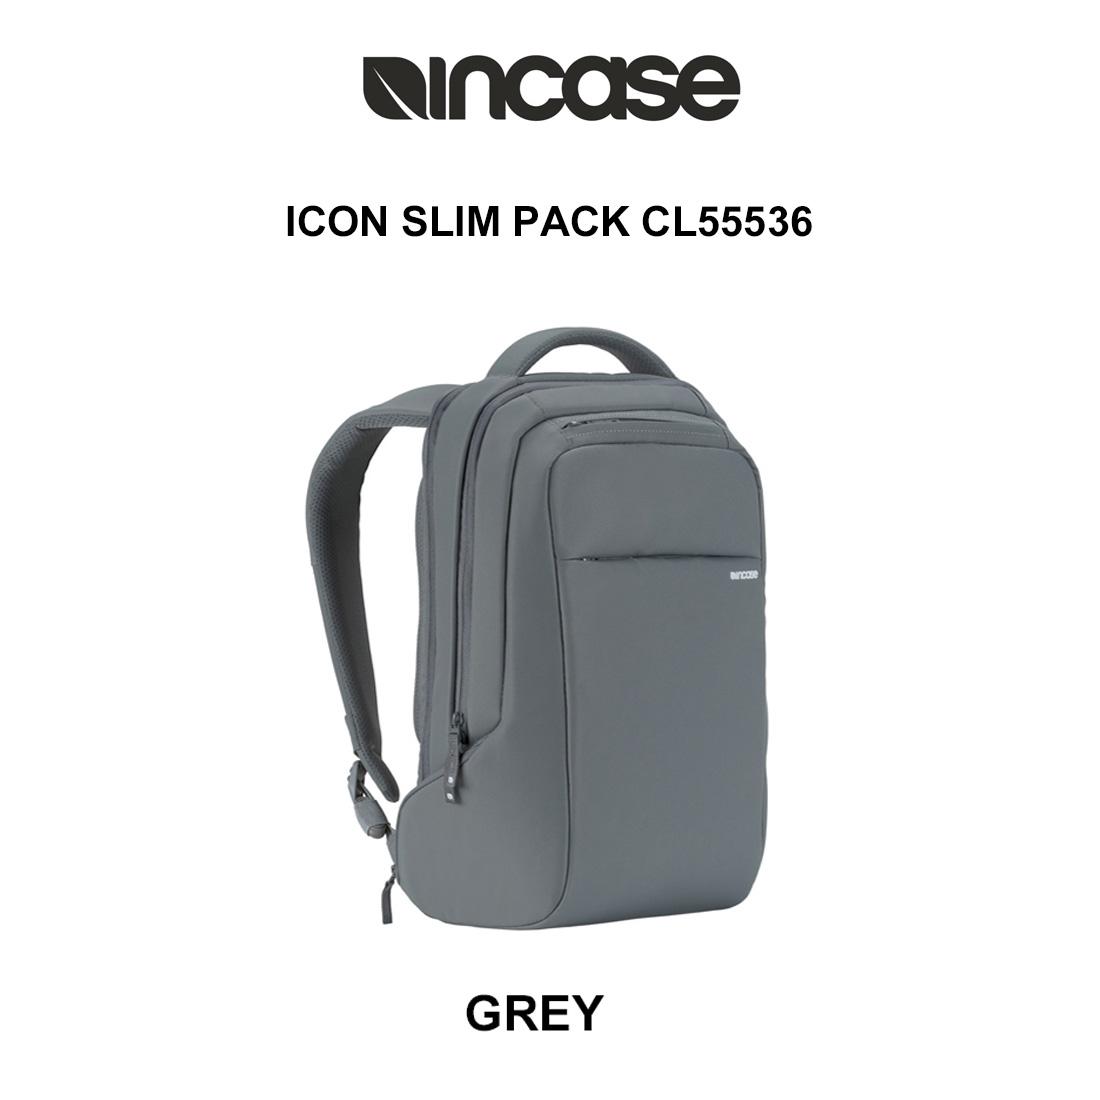 Incase(インケース)スリム バックパック リュック ICON SLIM PACK CL55536 Gray